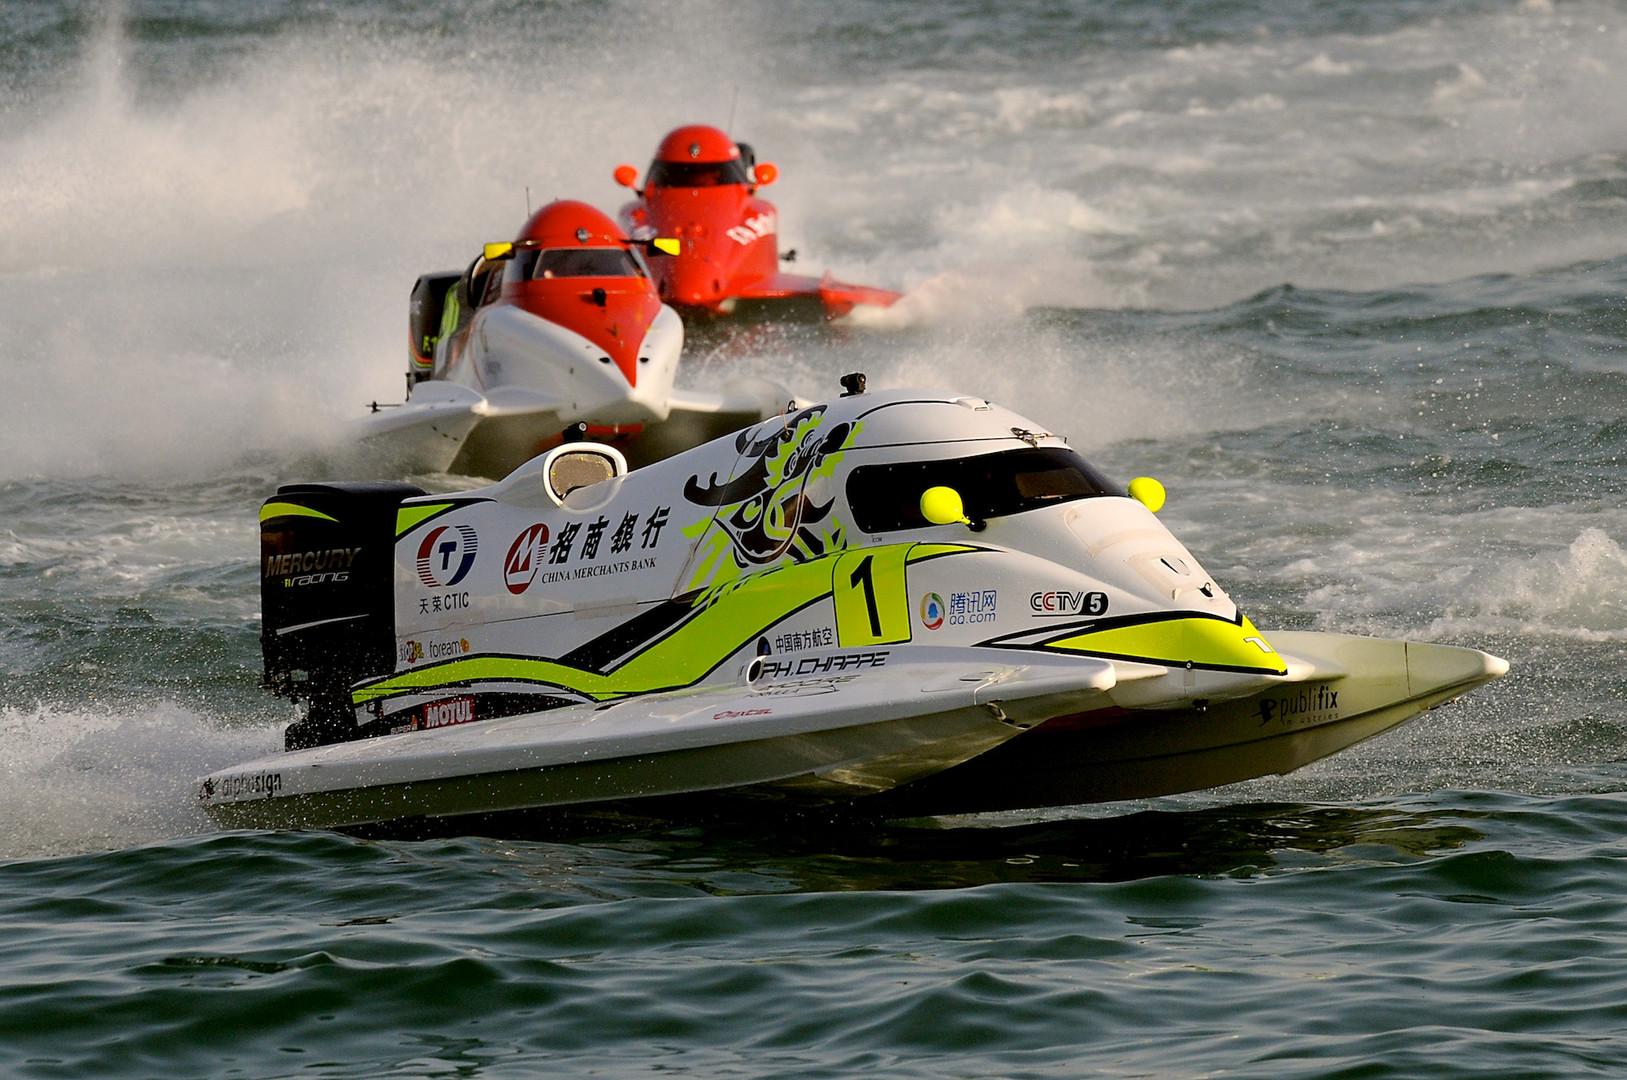 Formule 1 Inshore / Team Dessertenne